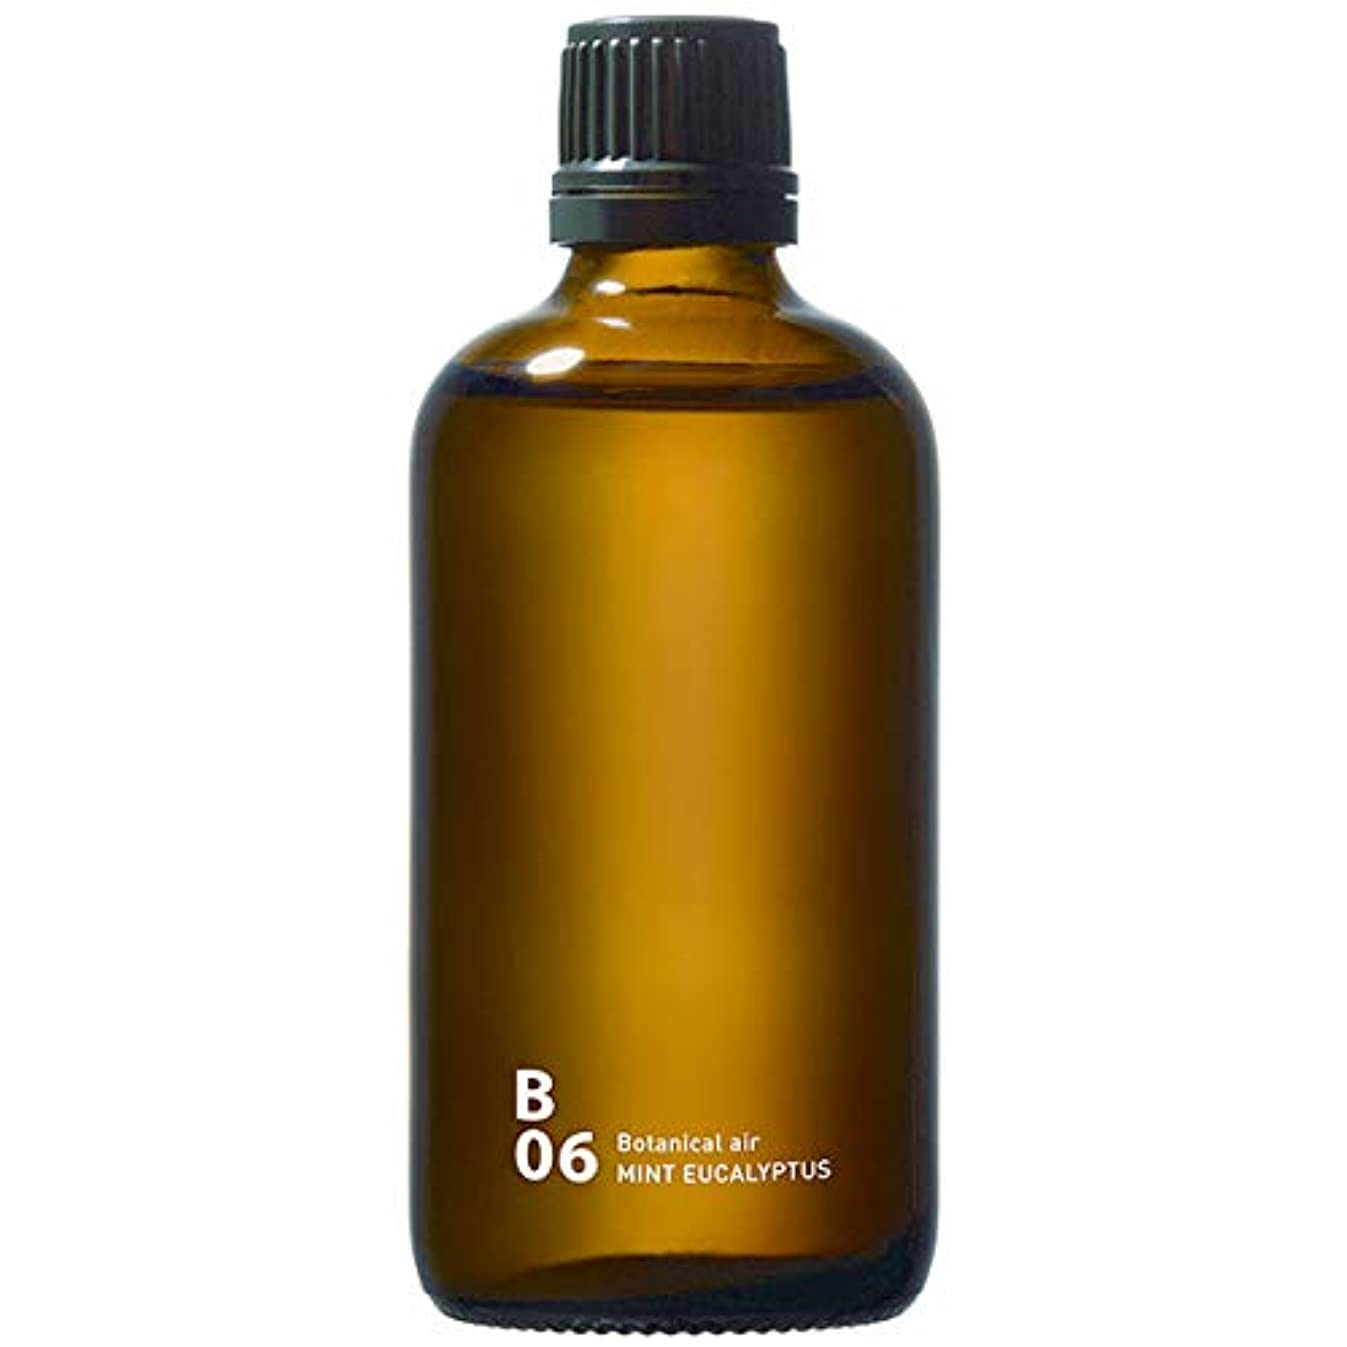 B06 MINT EUCALYPTUS piezo aroma oil 100ml